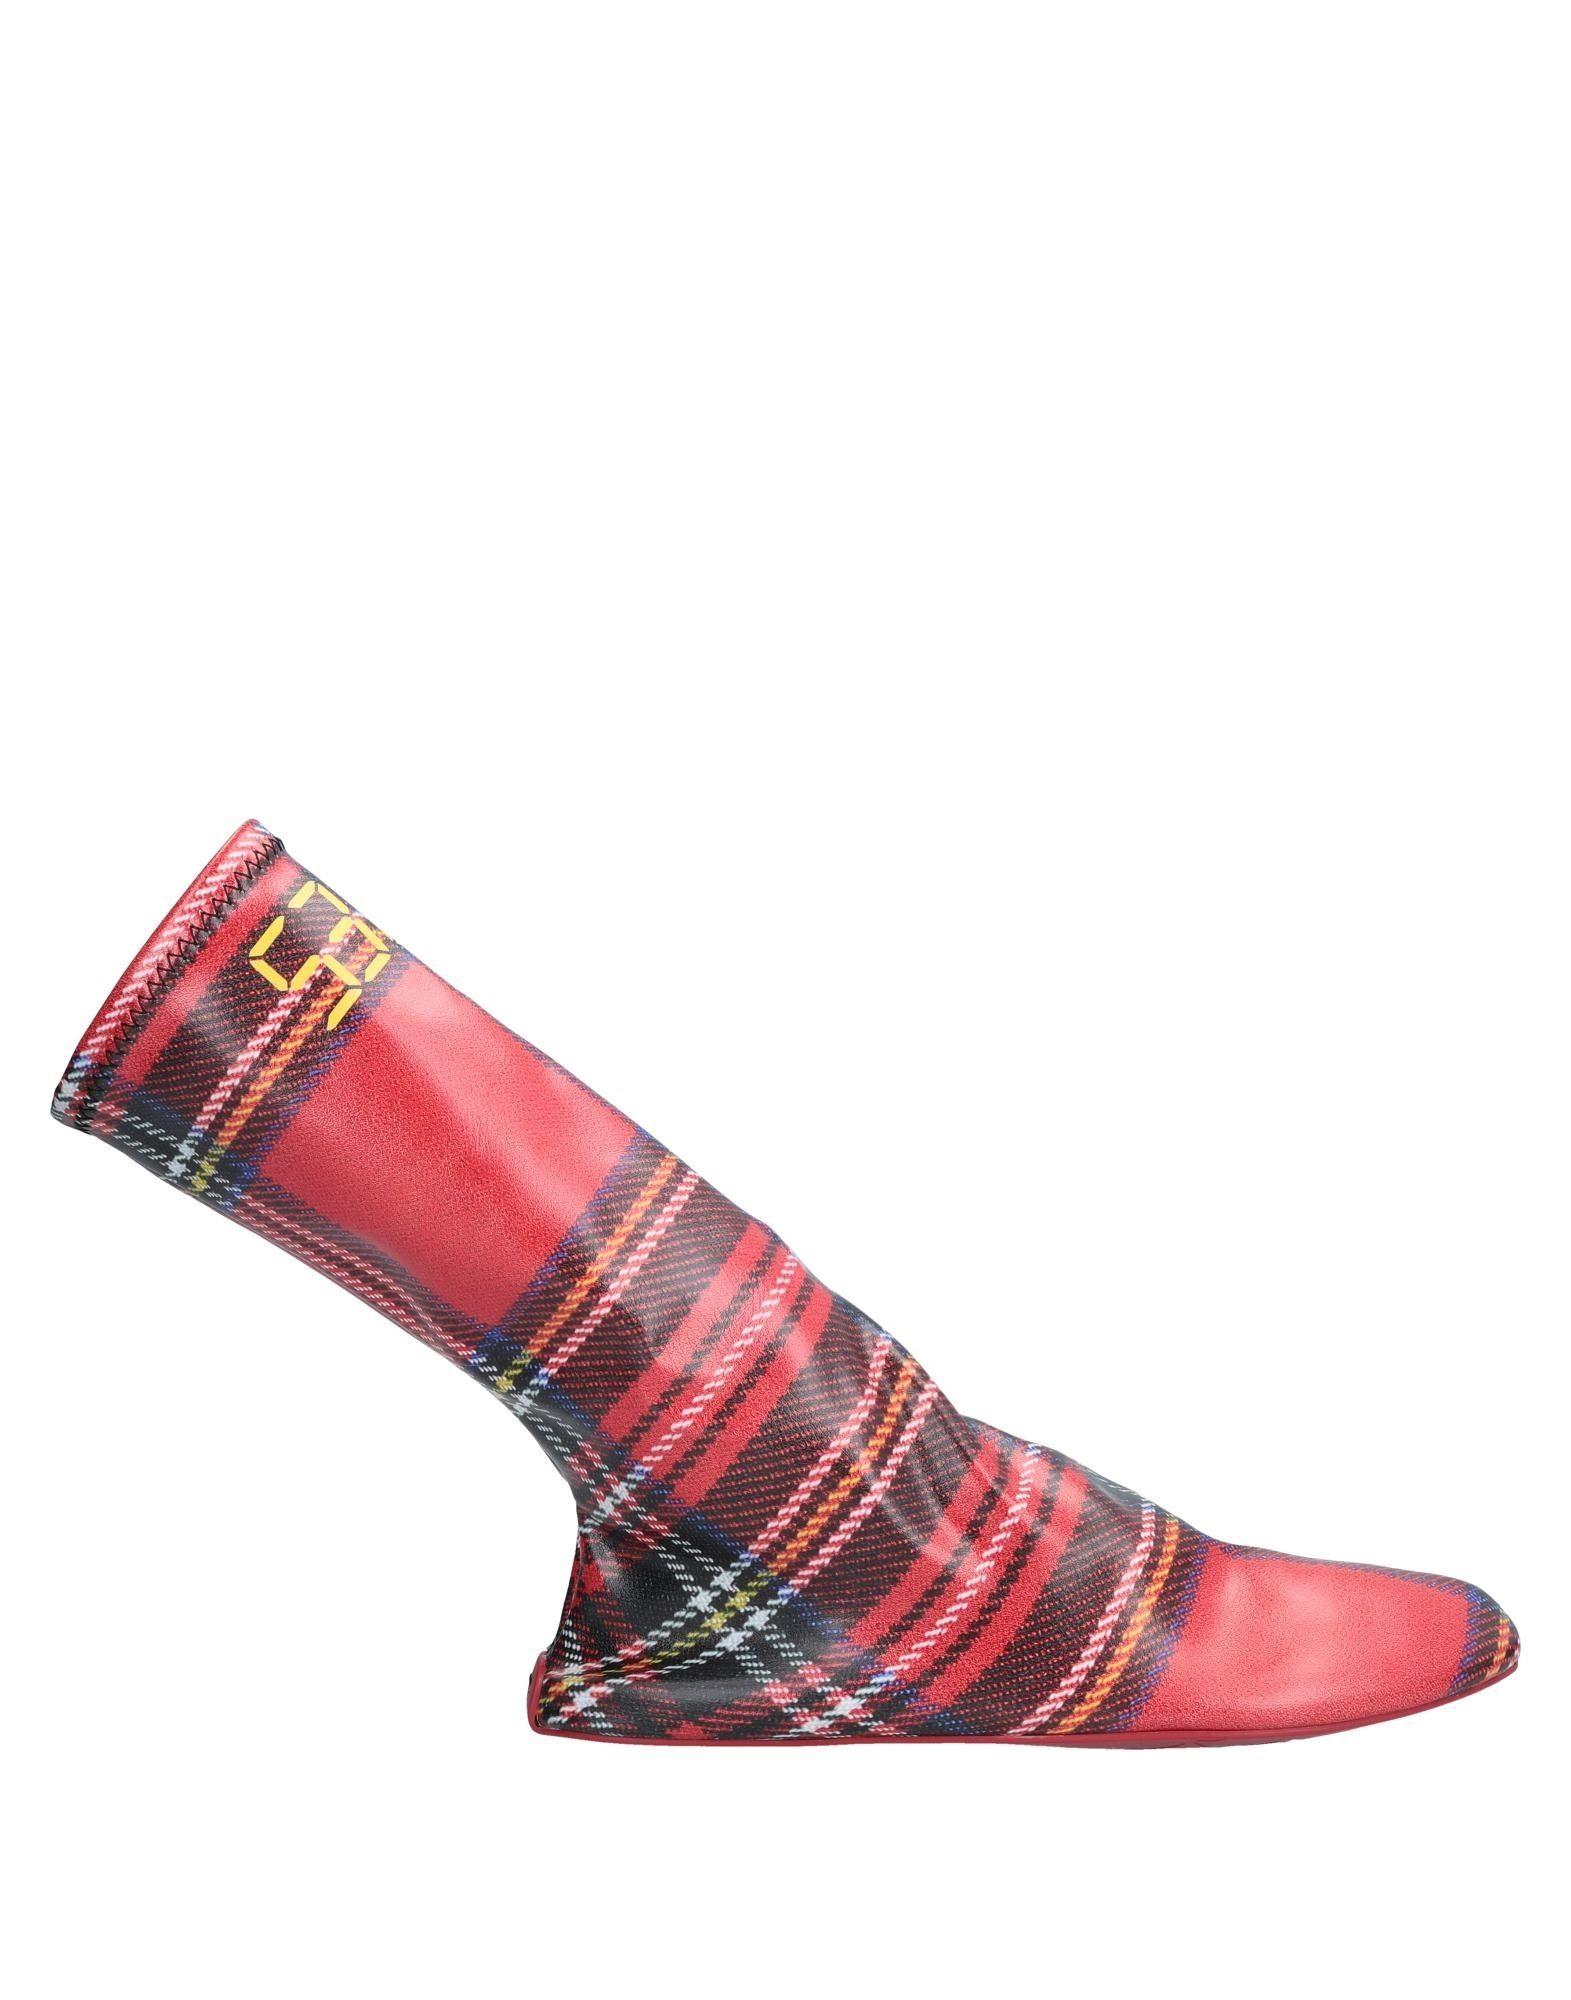 Stivaletti 53045 Shoes Shoes 53045 Donna - 11537429QC 69b4f5